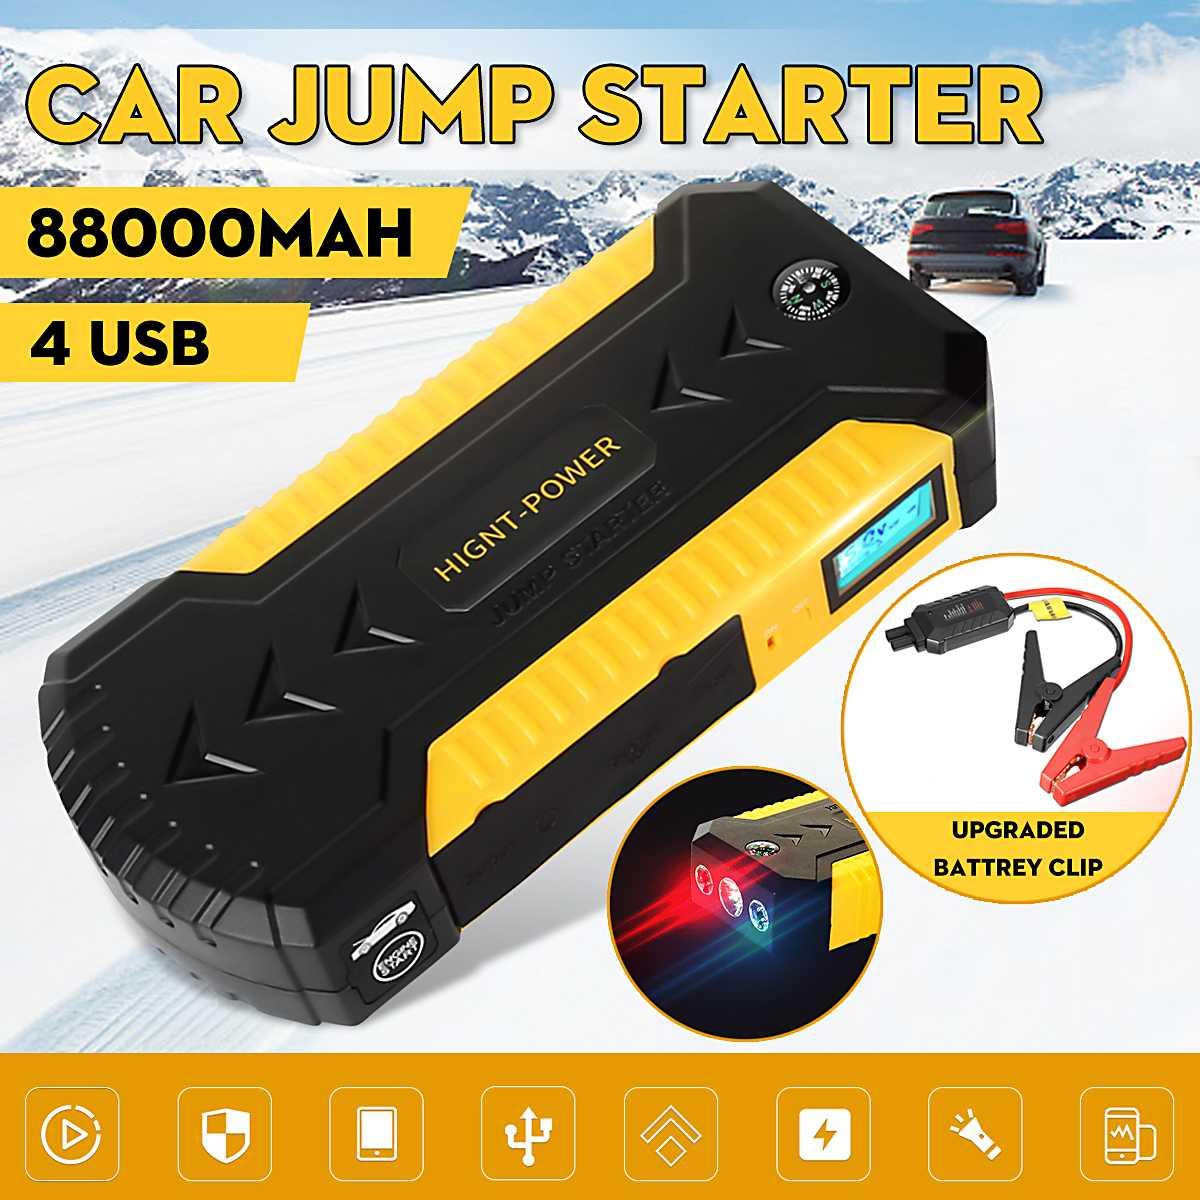 12V 82800MAh 600A Jump Starter SetEngineฉุกเฉินStart Over-Currentป้องกันแบตเตอรี่ 4 USB Power Bank LED W/คลิป